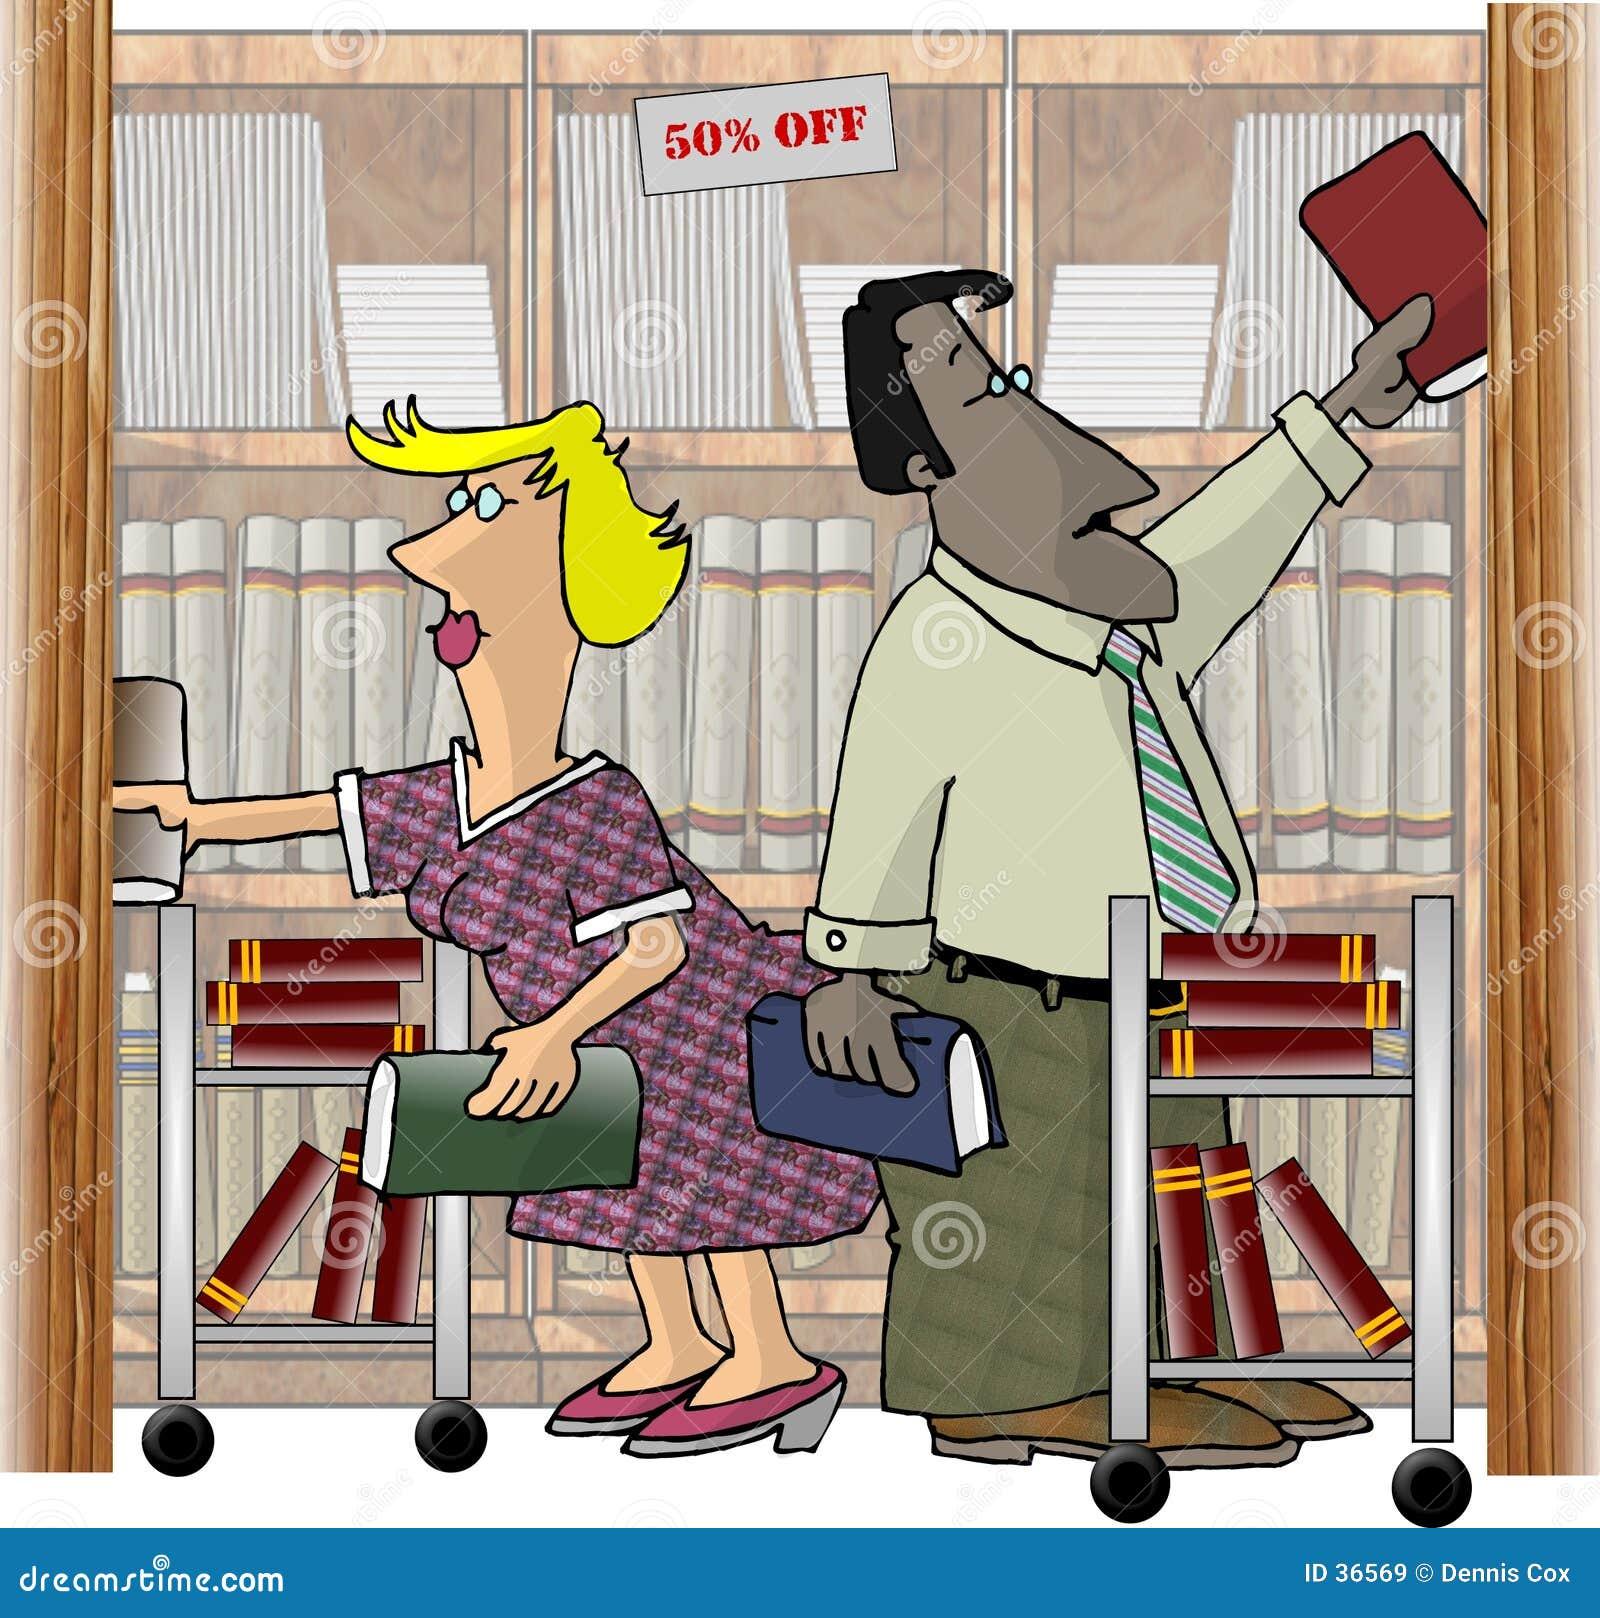 Księgarnia pracowników